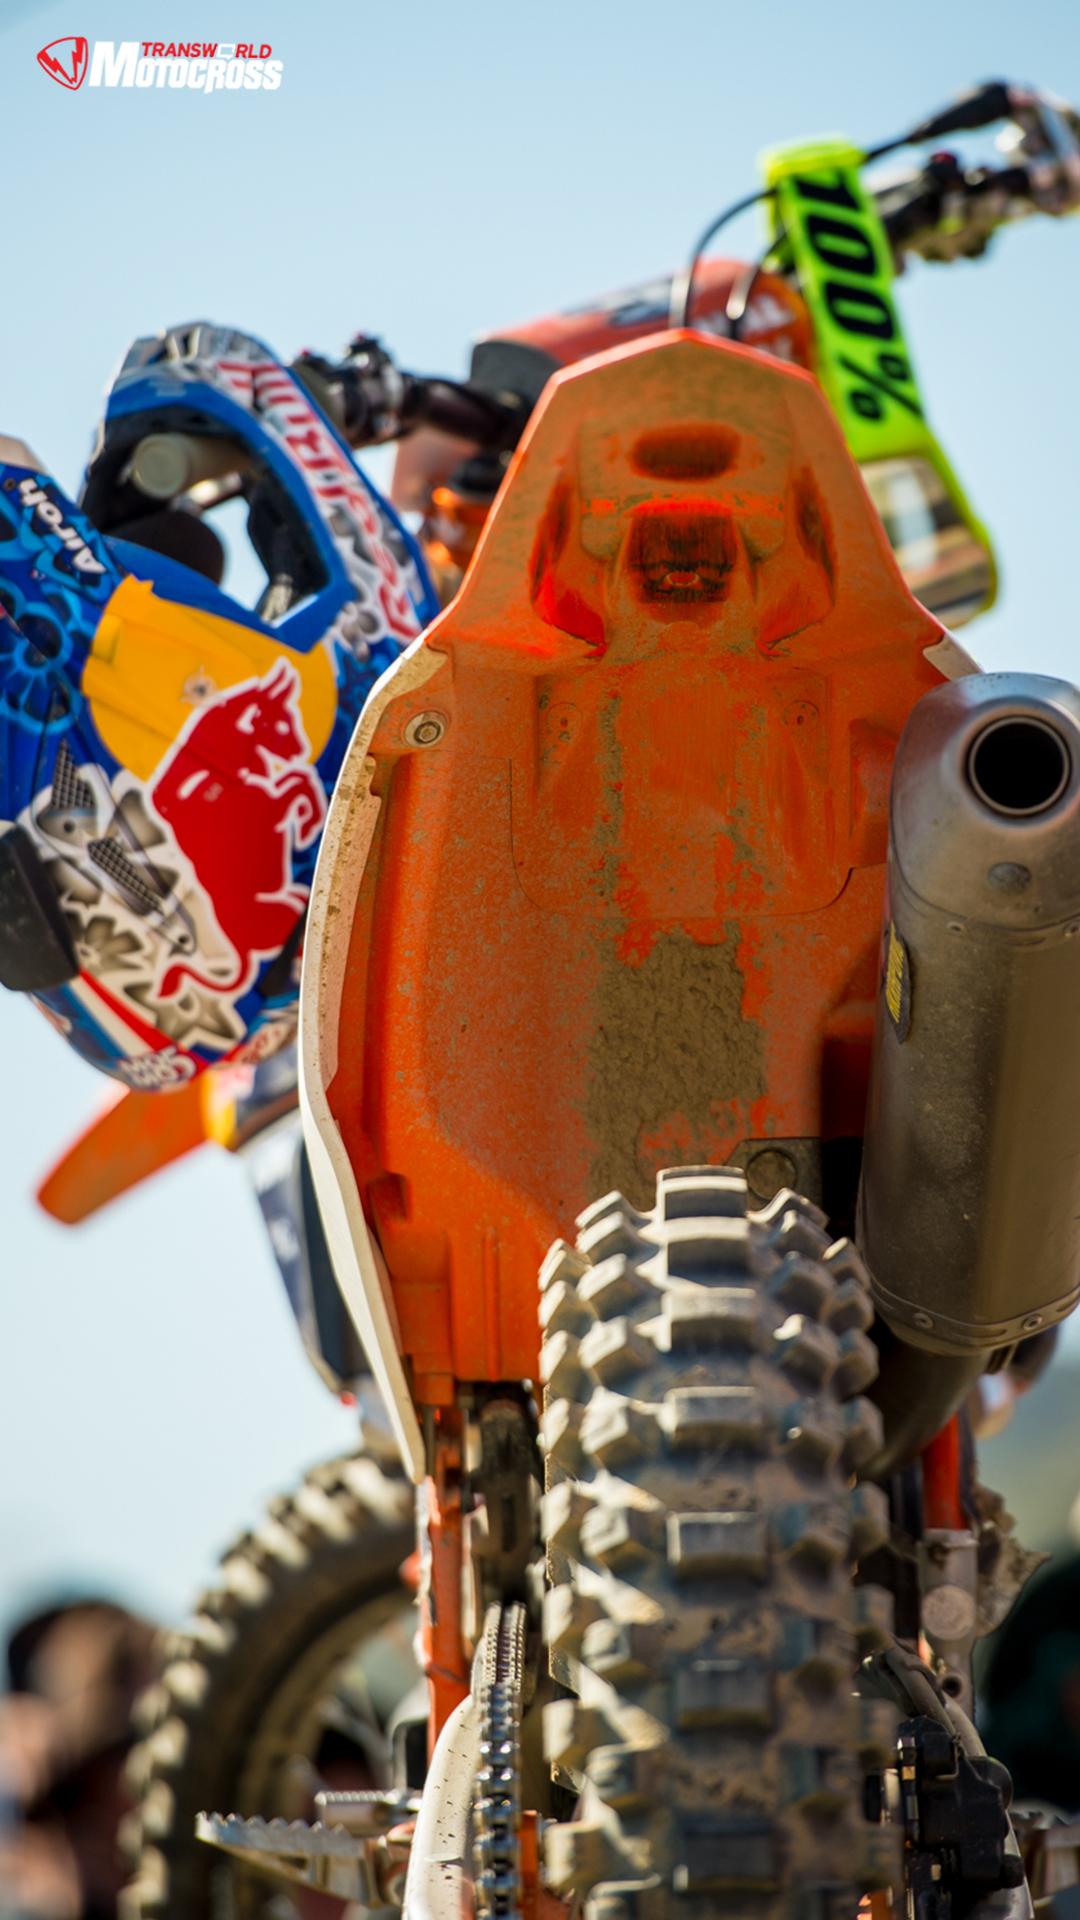 Click To Enlarge Dirt Bike Wallpaper Hd Iphone 2111534 Hd Wallpaper Backgrounds Download